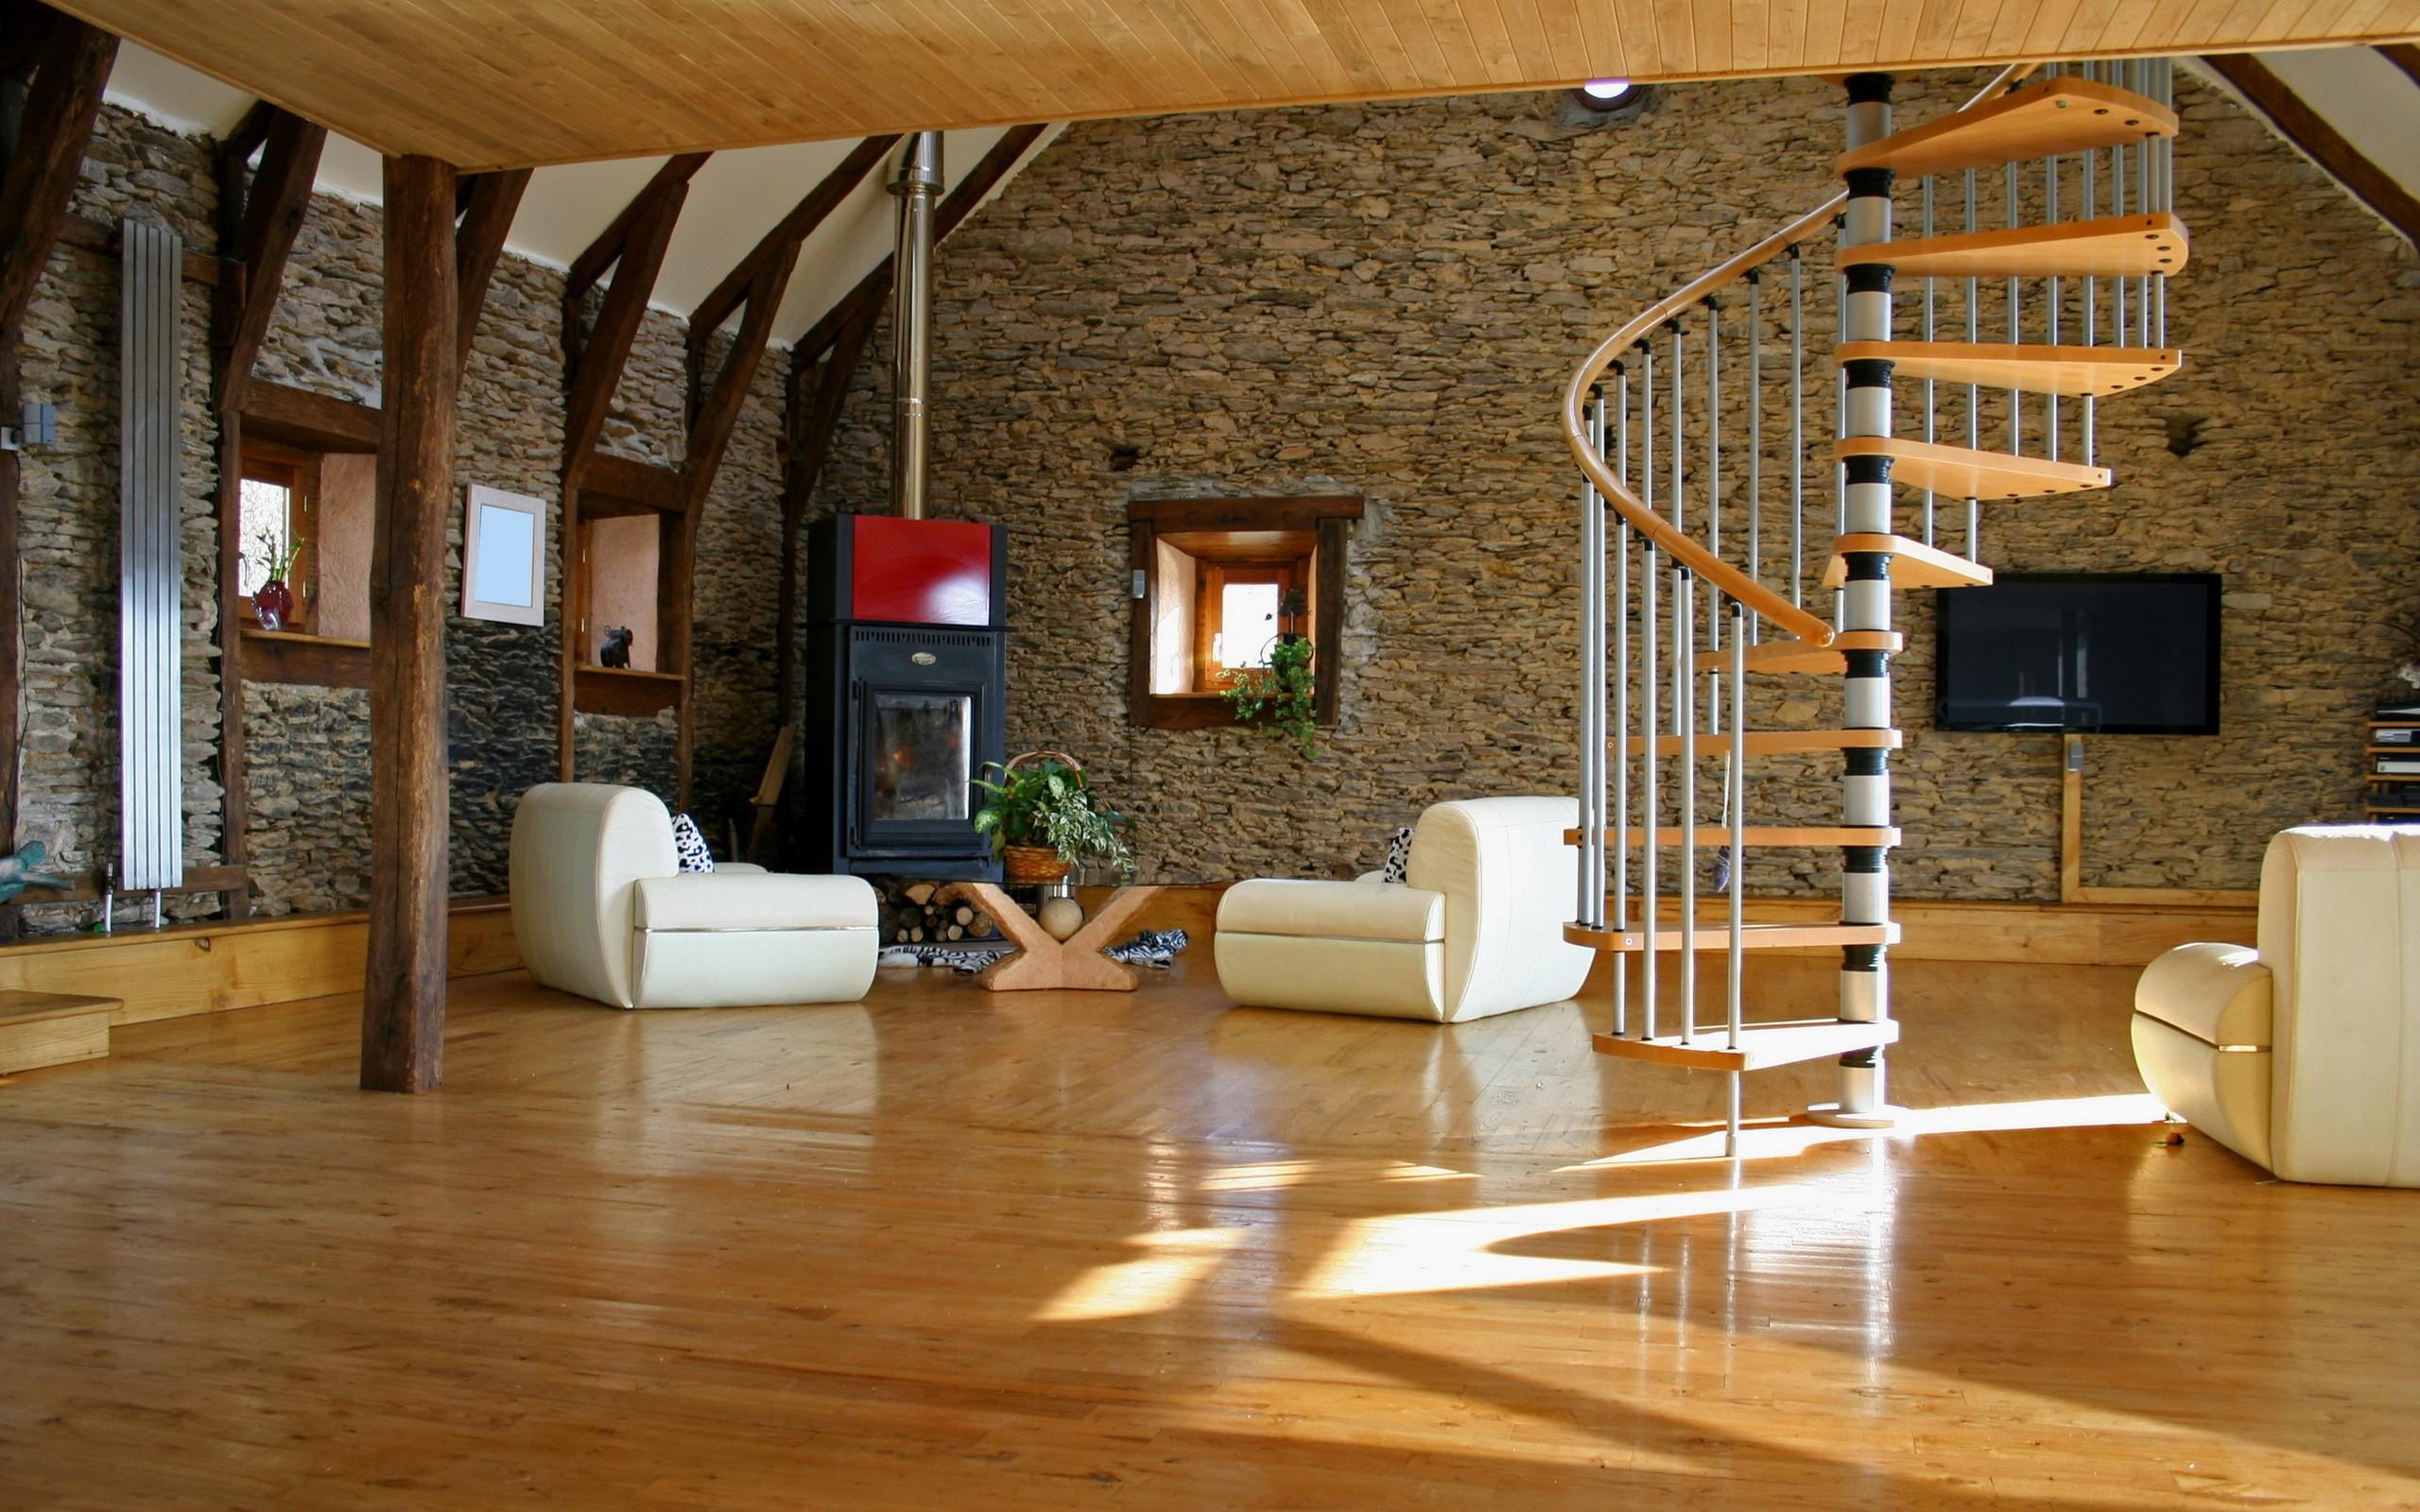 House Stairs Interior Design Cottage, Estate Living Laminate Flooring